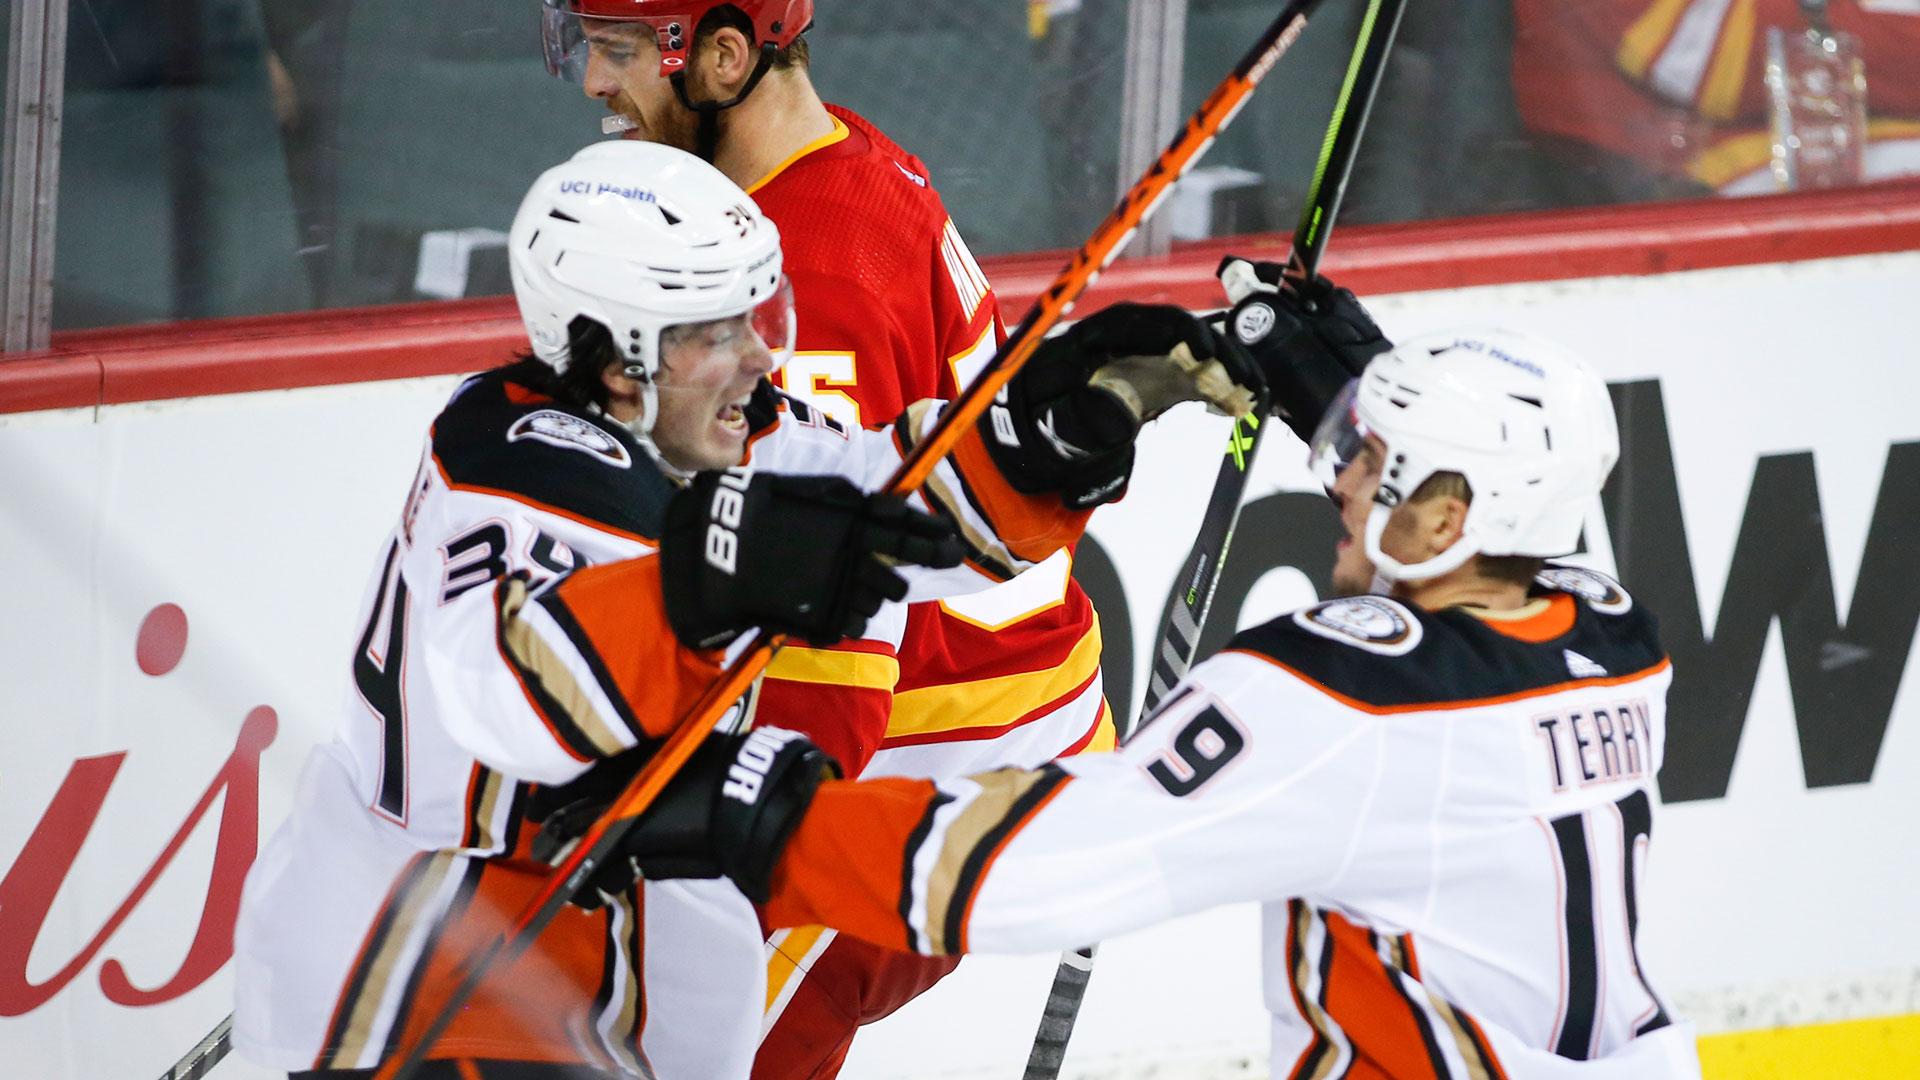 NHL: Ducks 3, Flames 2 (OT)